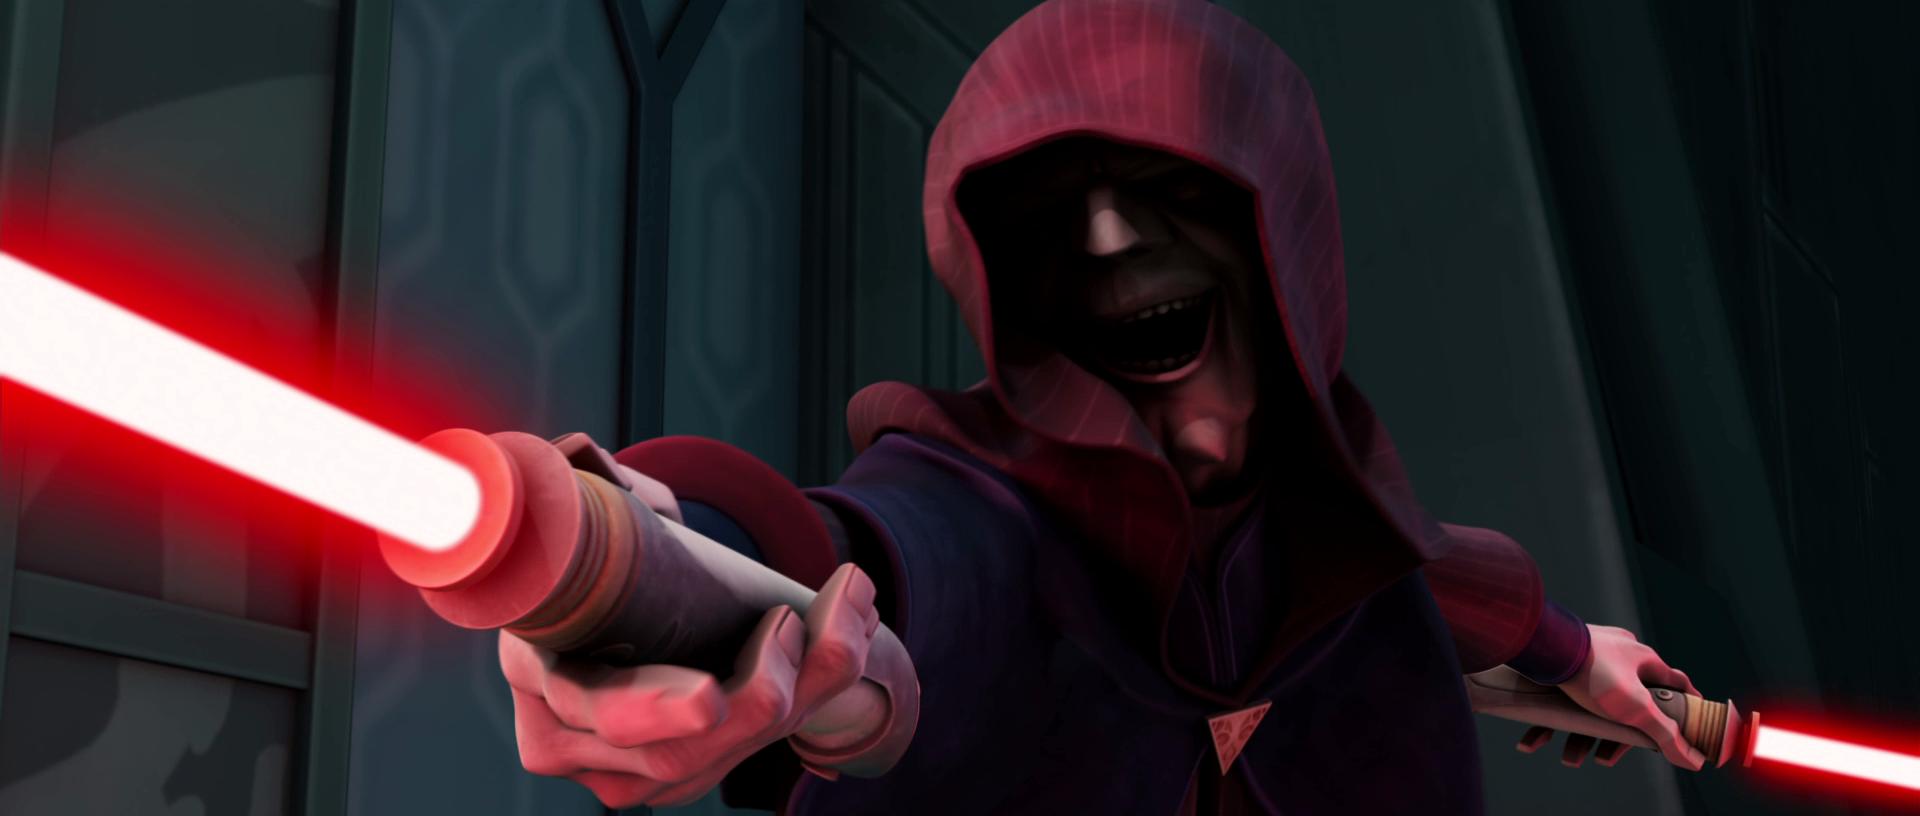 Maître Sith